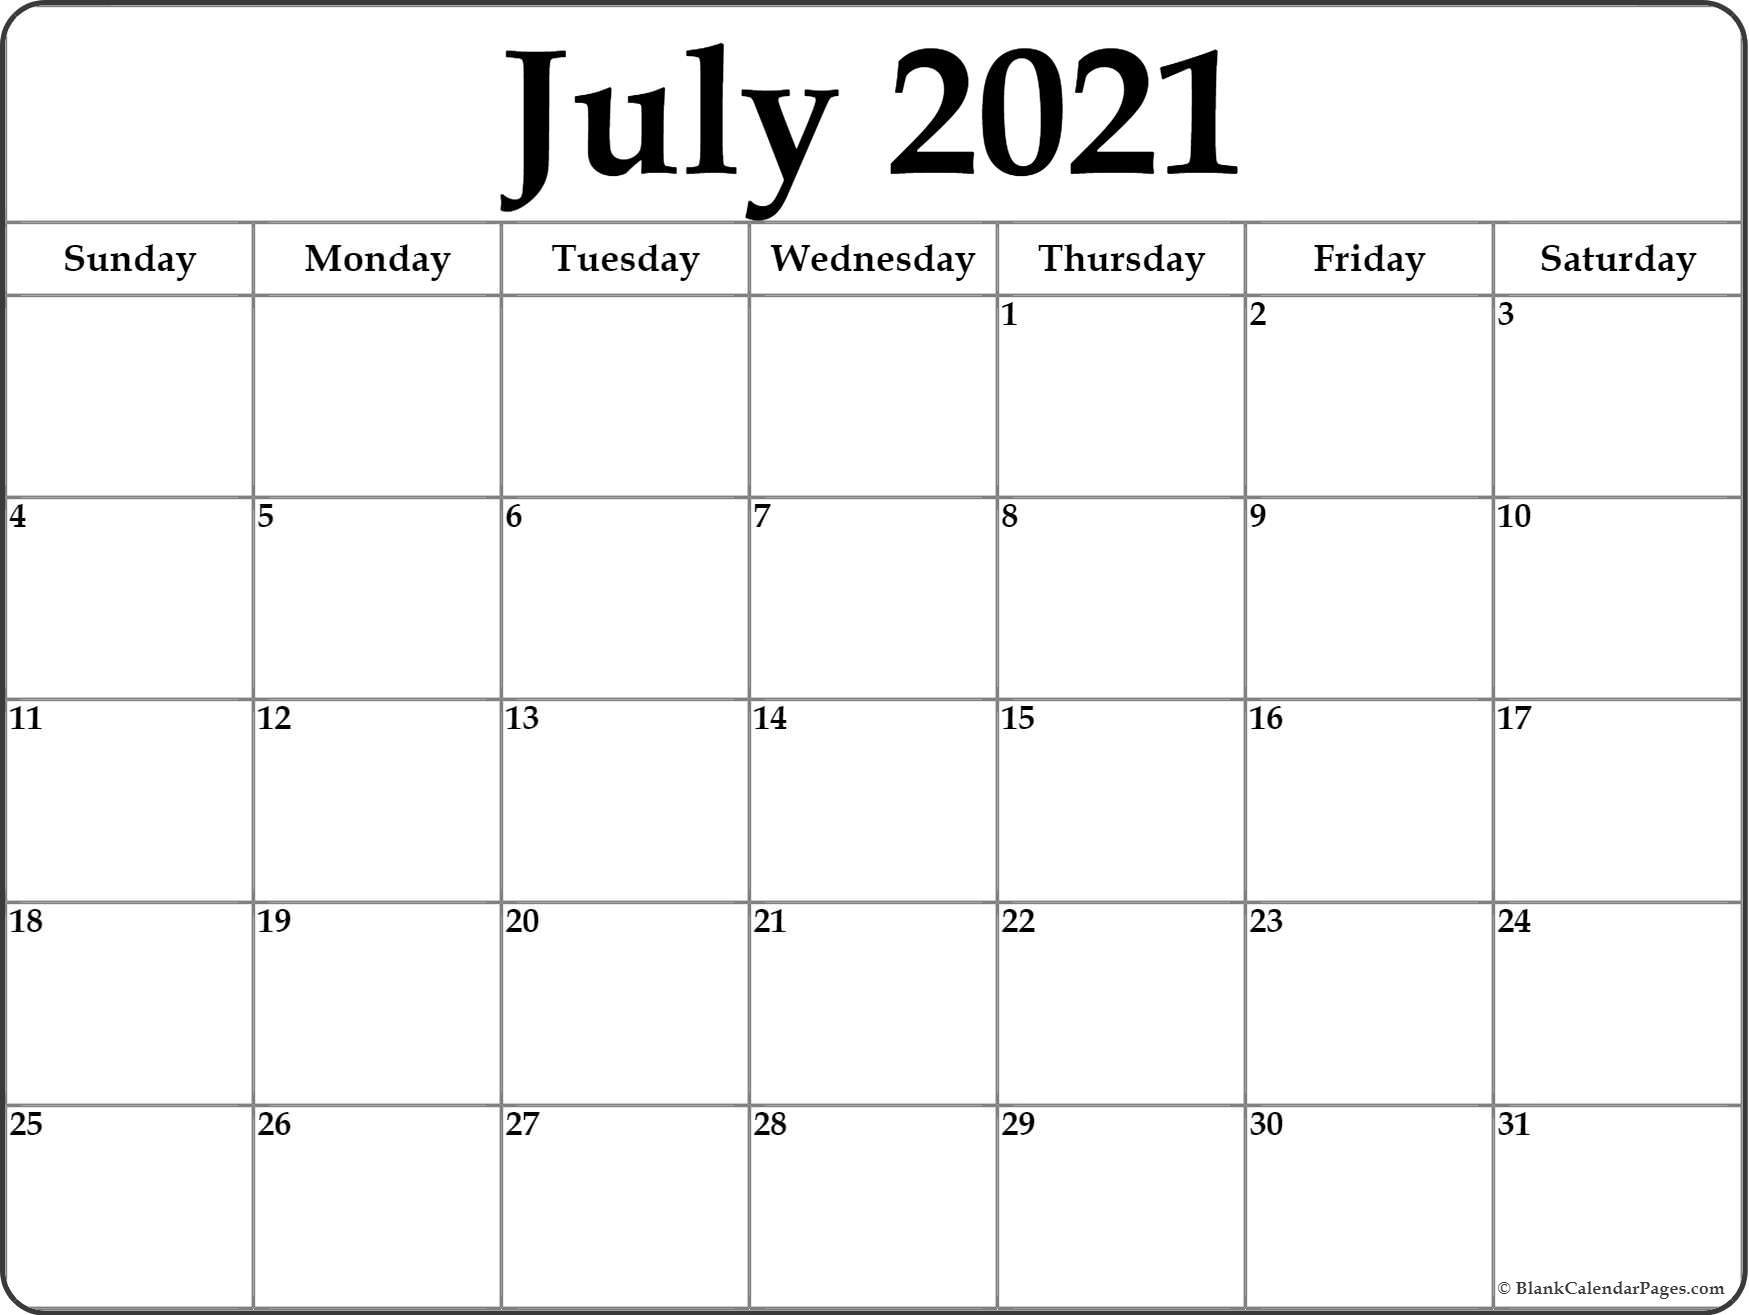 July 2021 Calendar | Free Printable Monthly Calendars  Summer Months 2021 Calendar